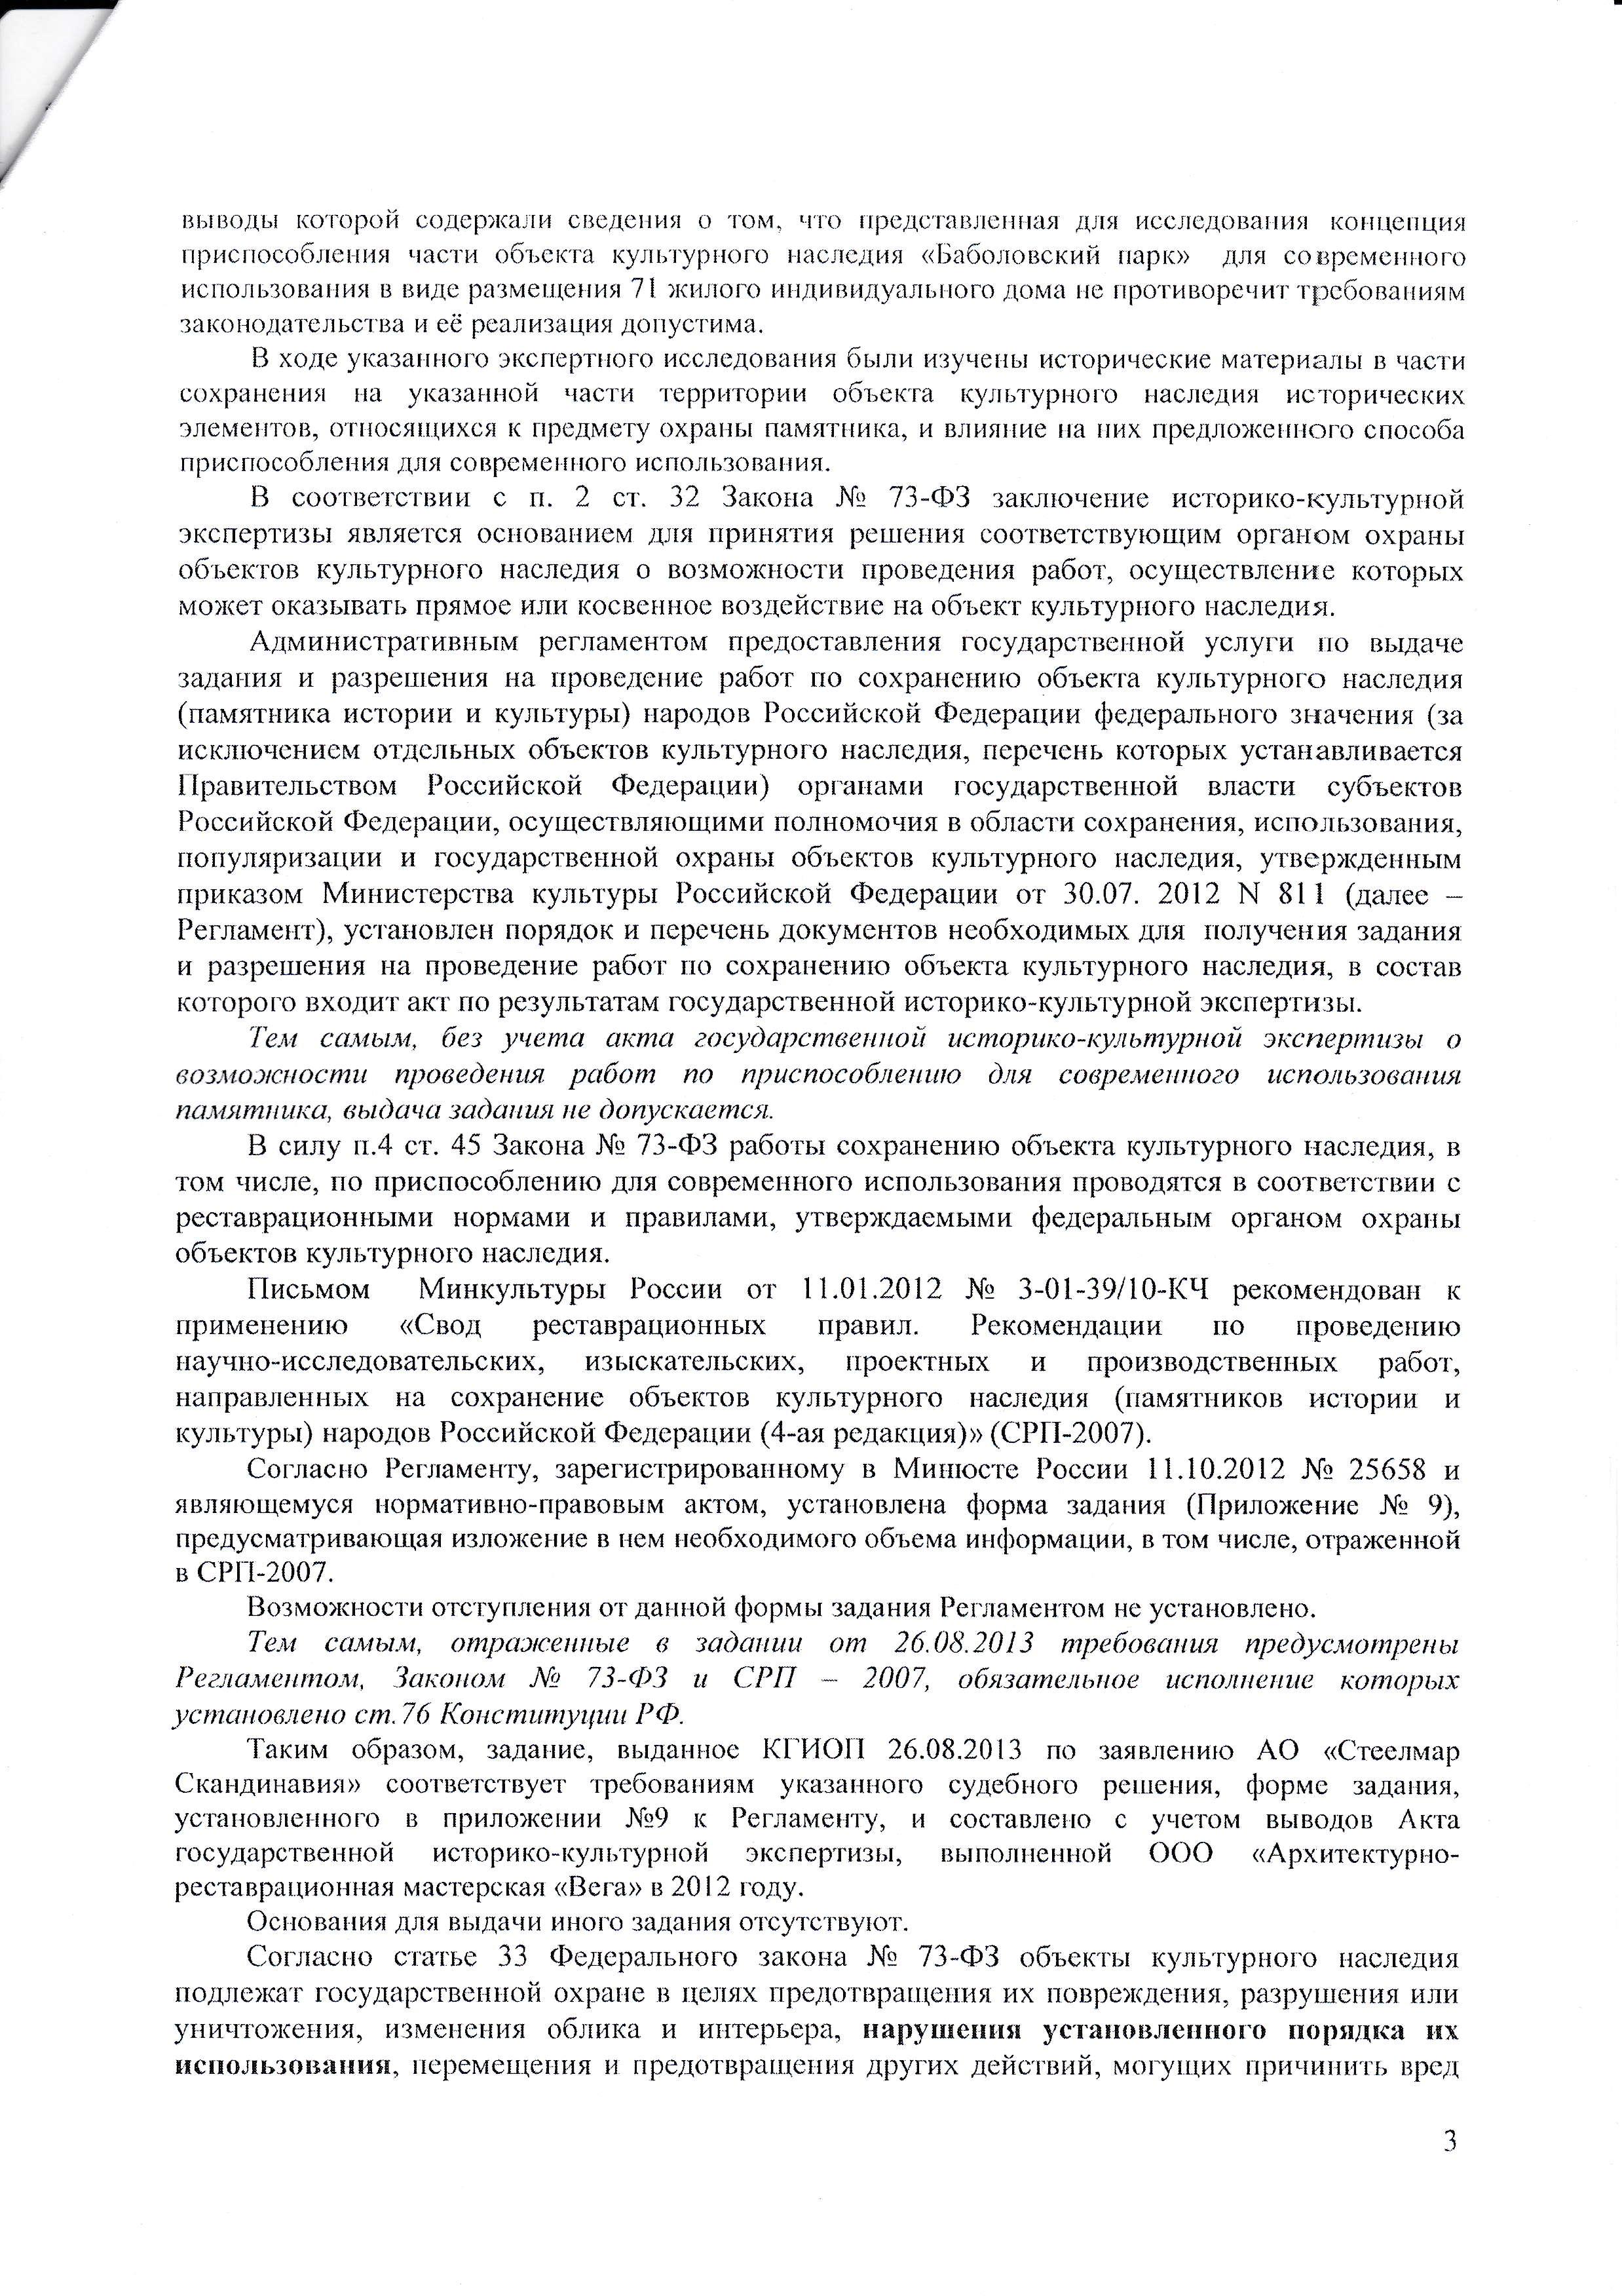 IMG_20140205_0003